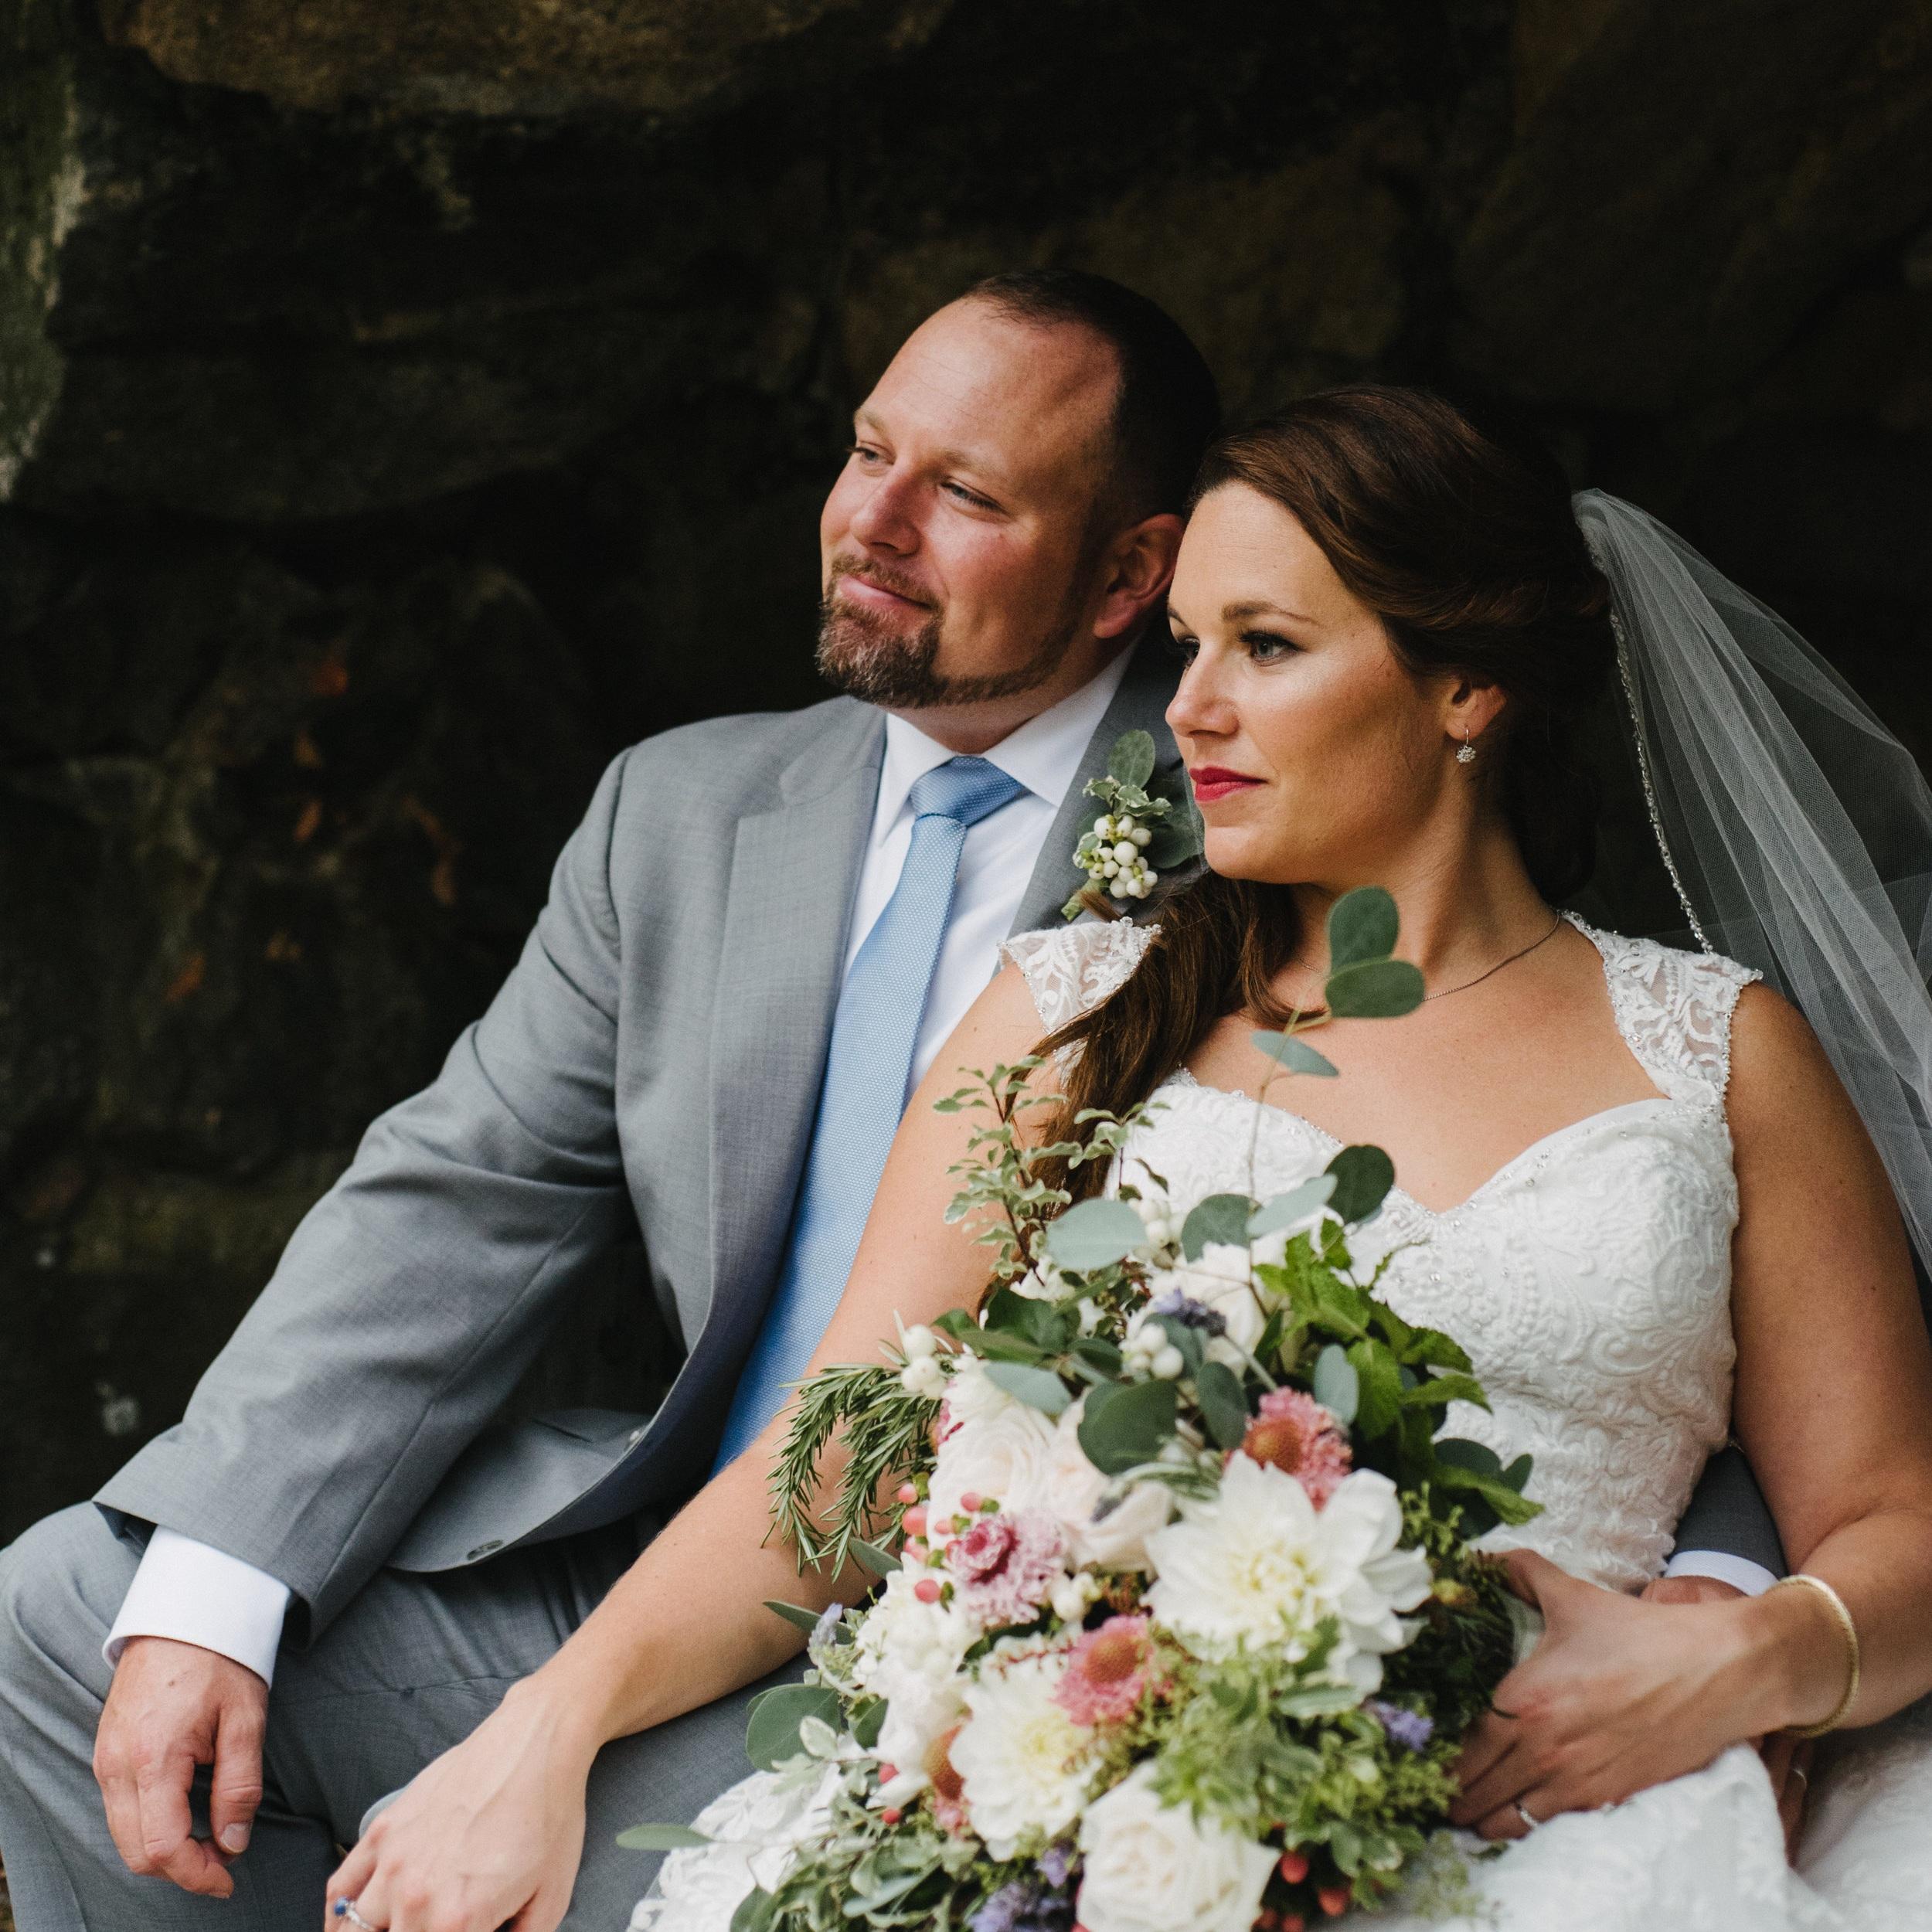 north+shore+massachusetts+boston+wedding+beverly+moraine+farm+photographer-1.jpg